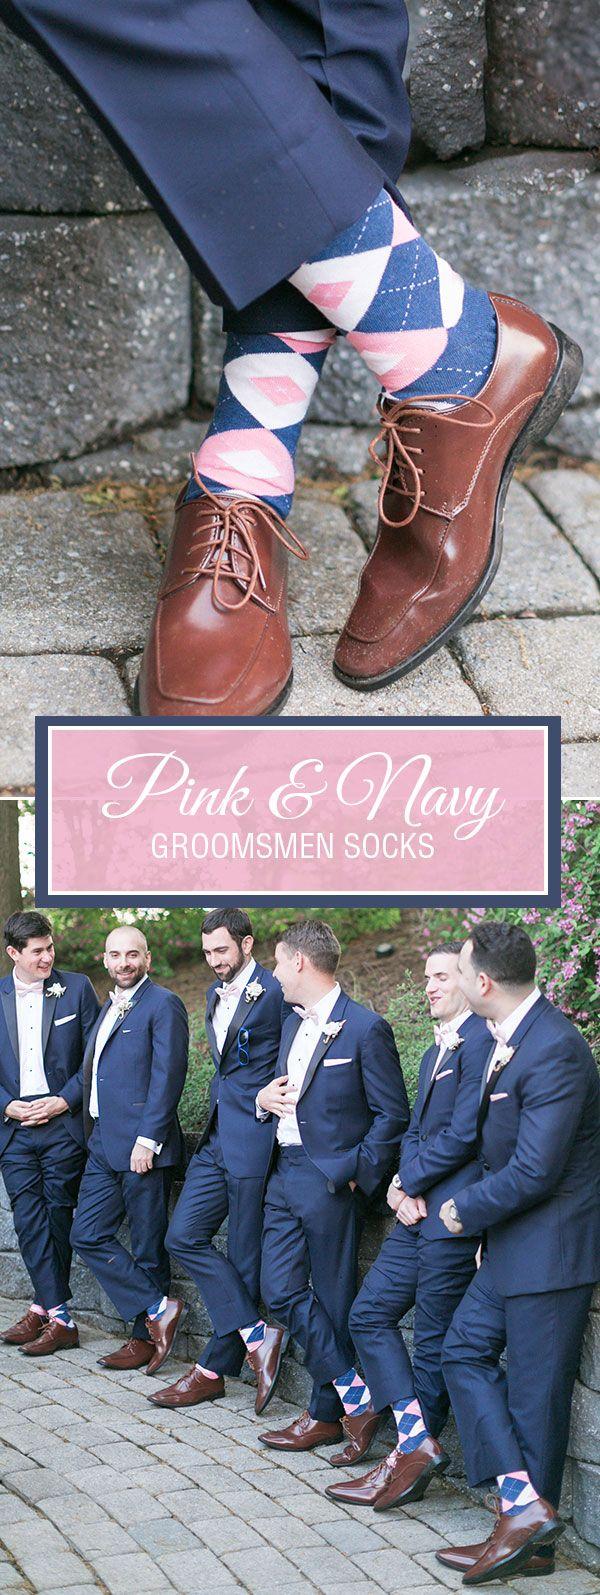 Salmon colored dress socks